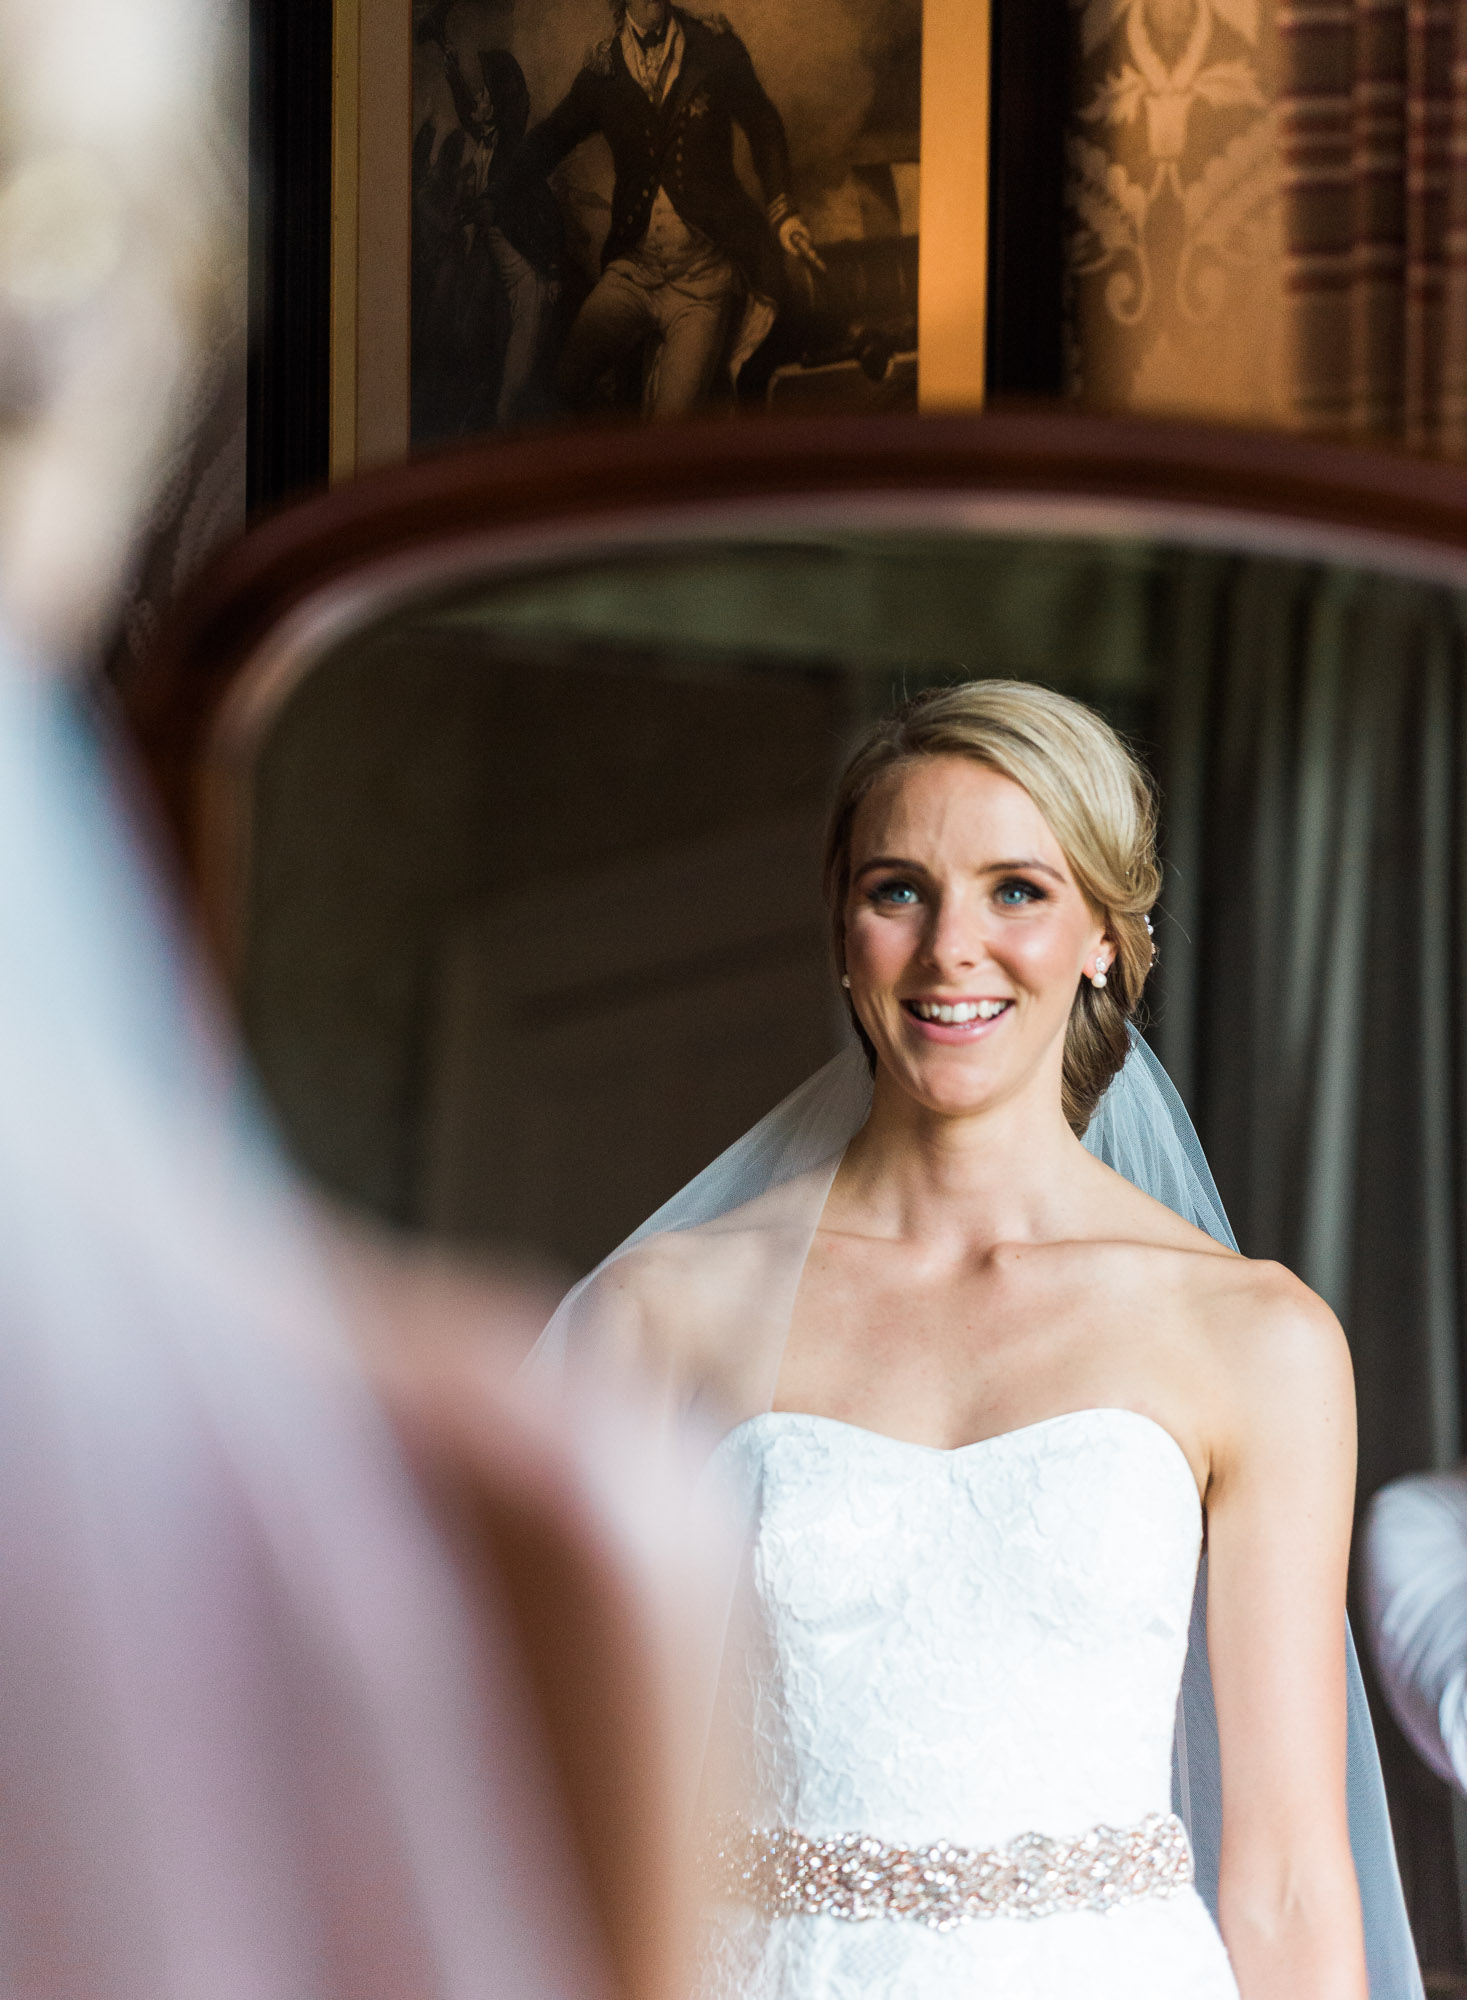 scottish_wedding_blairquhan_castle-35.jpg